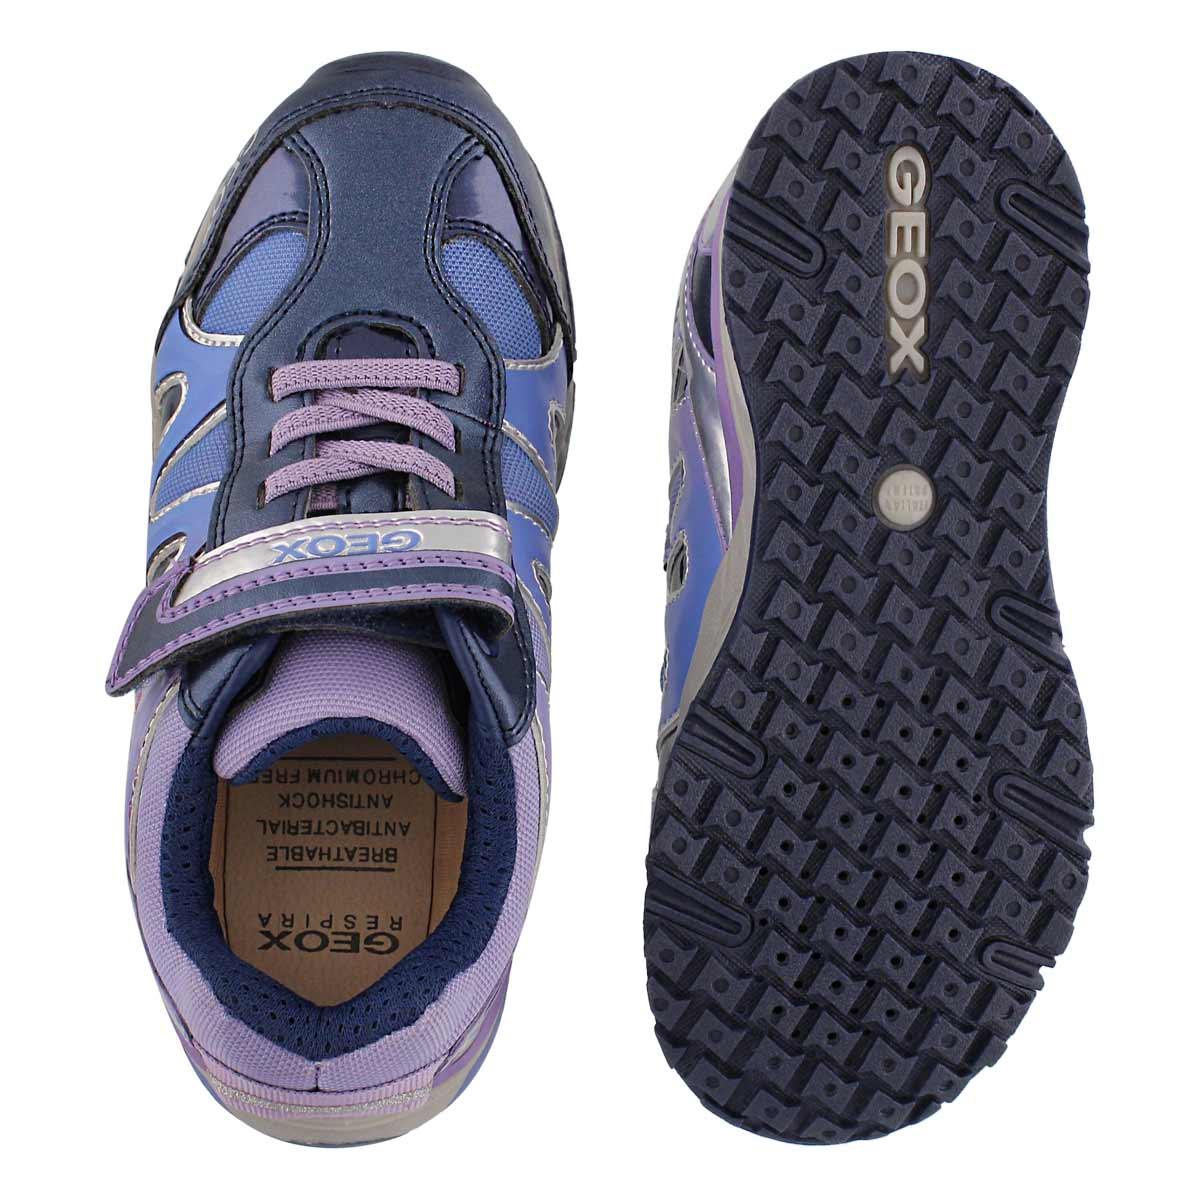 Grls Bernie navy/lilac sneaker